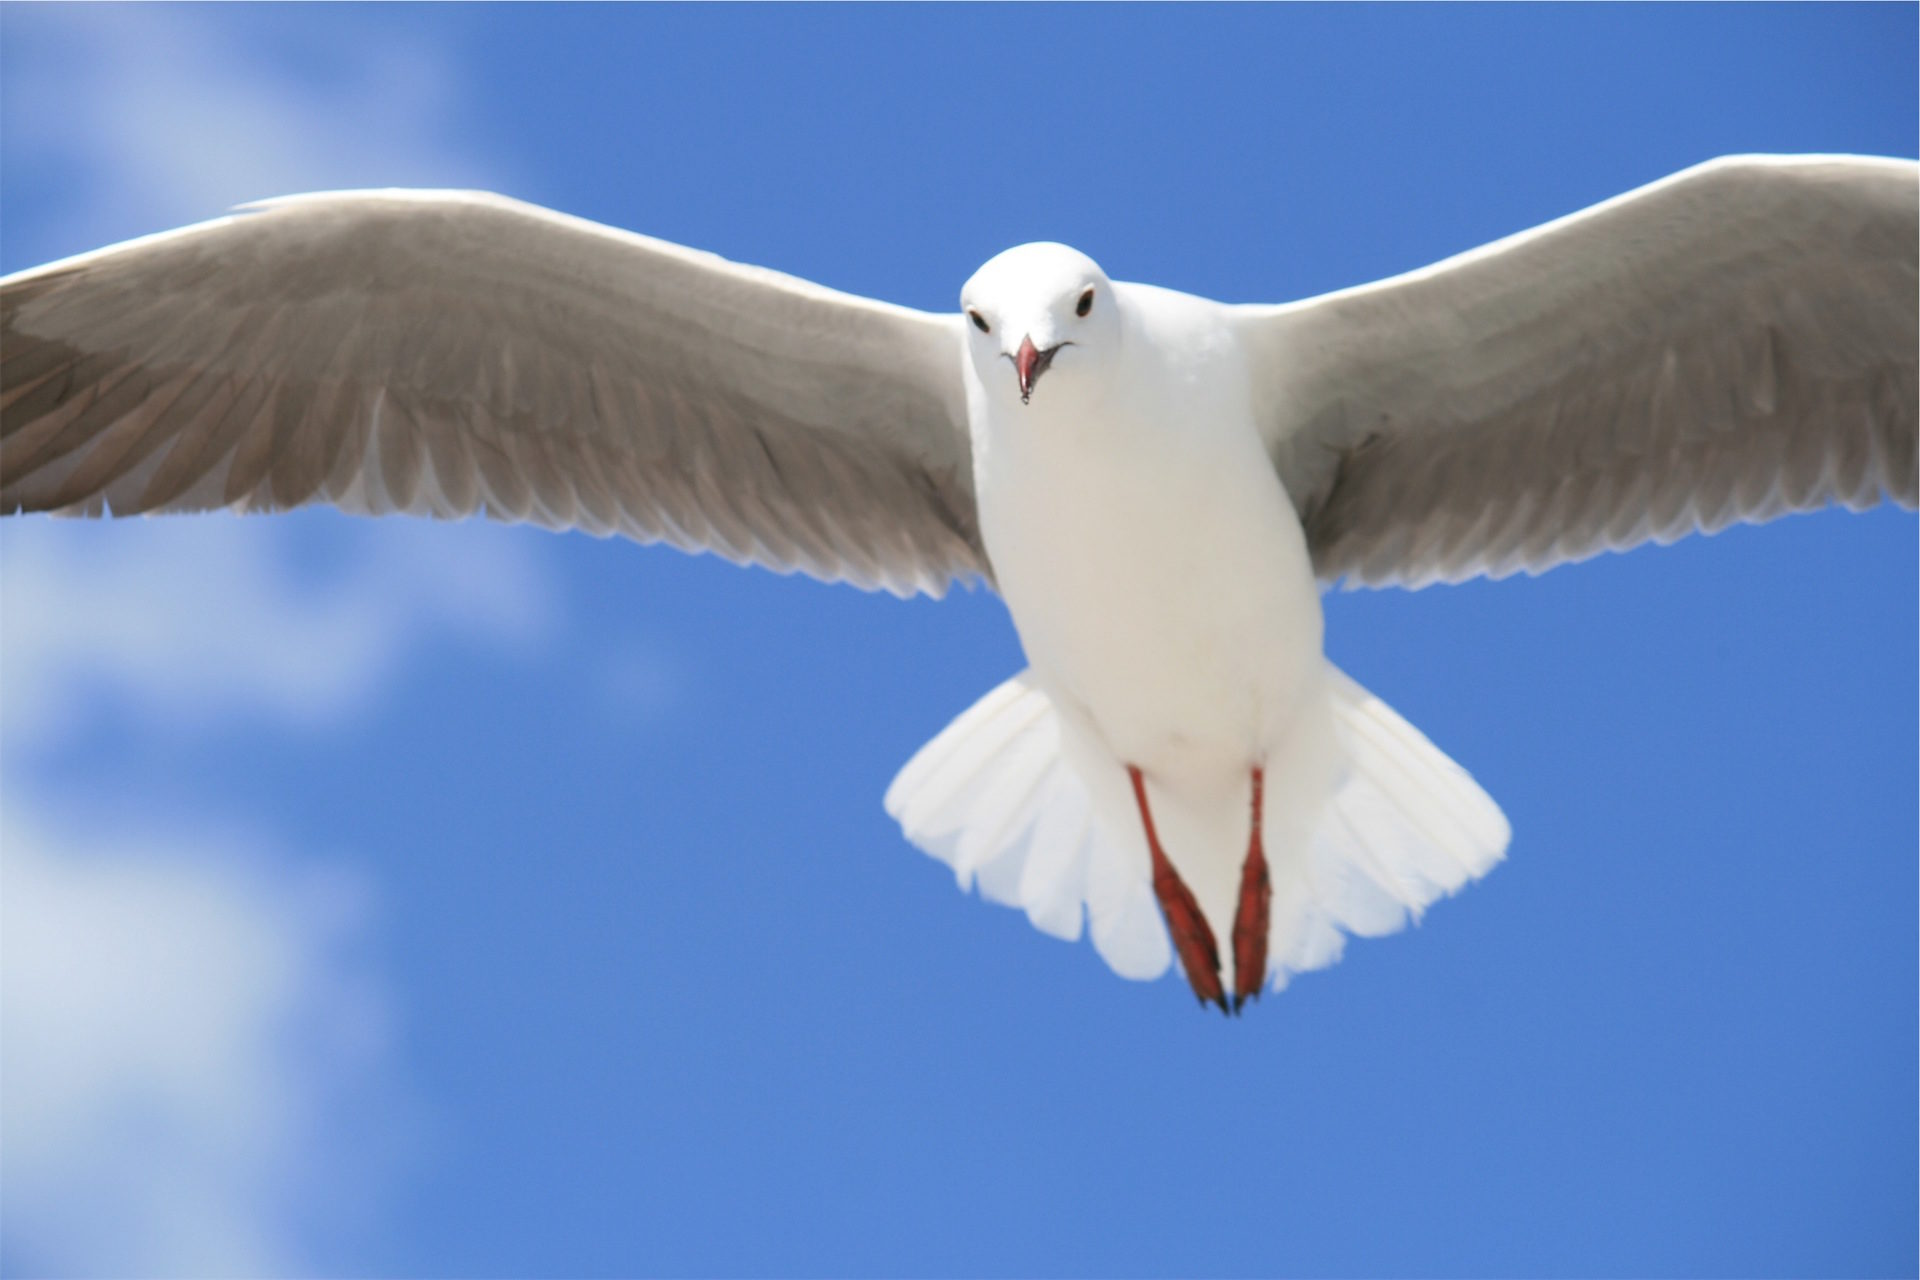 gaviota, alas, vuelo, ave, cielo - Fondos de Pantalla HD - professor-falken.com